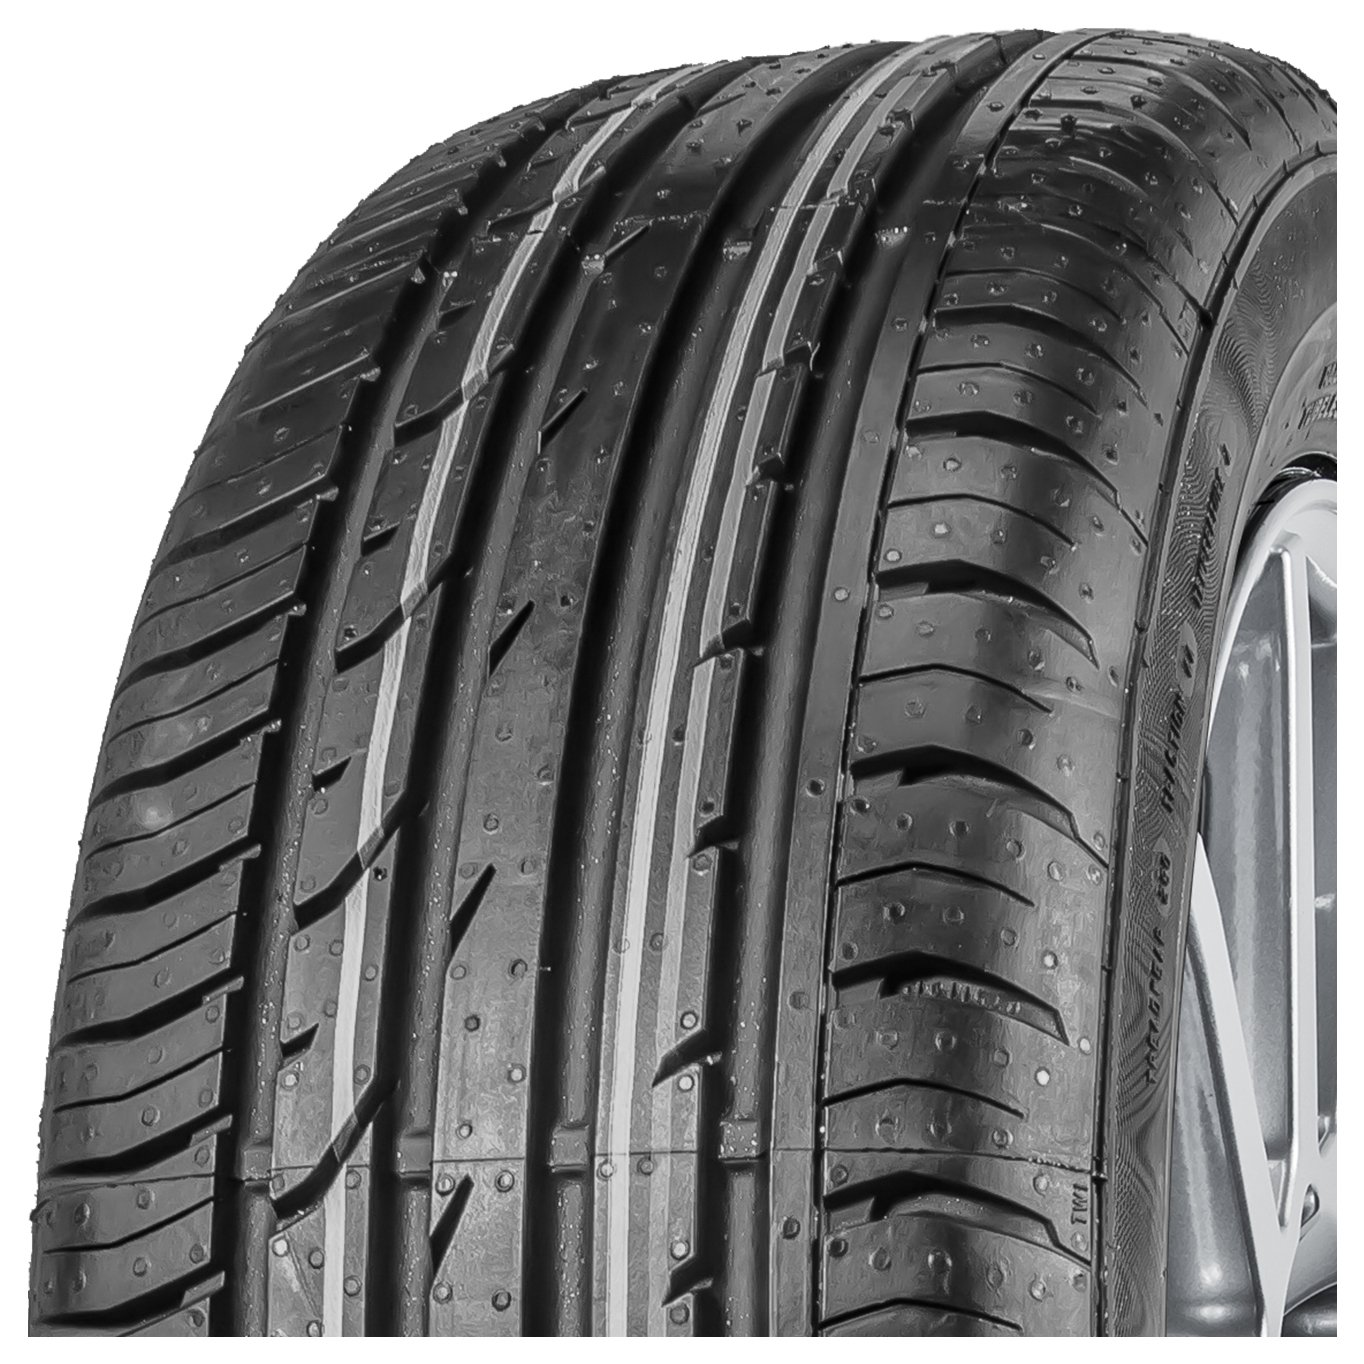 pneu continental 215 55 r18 99v